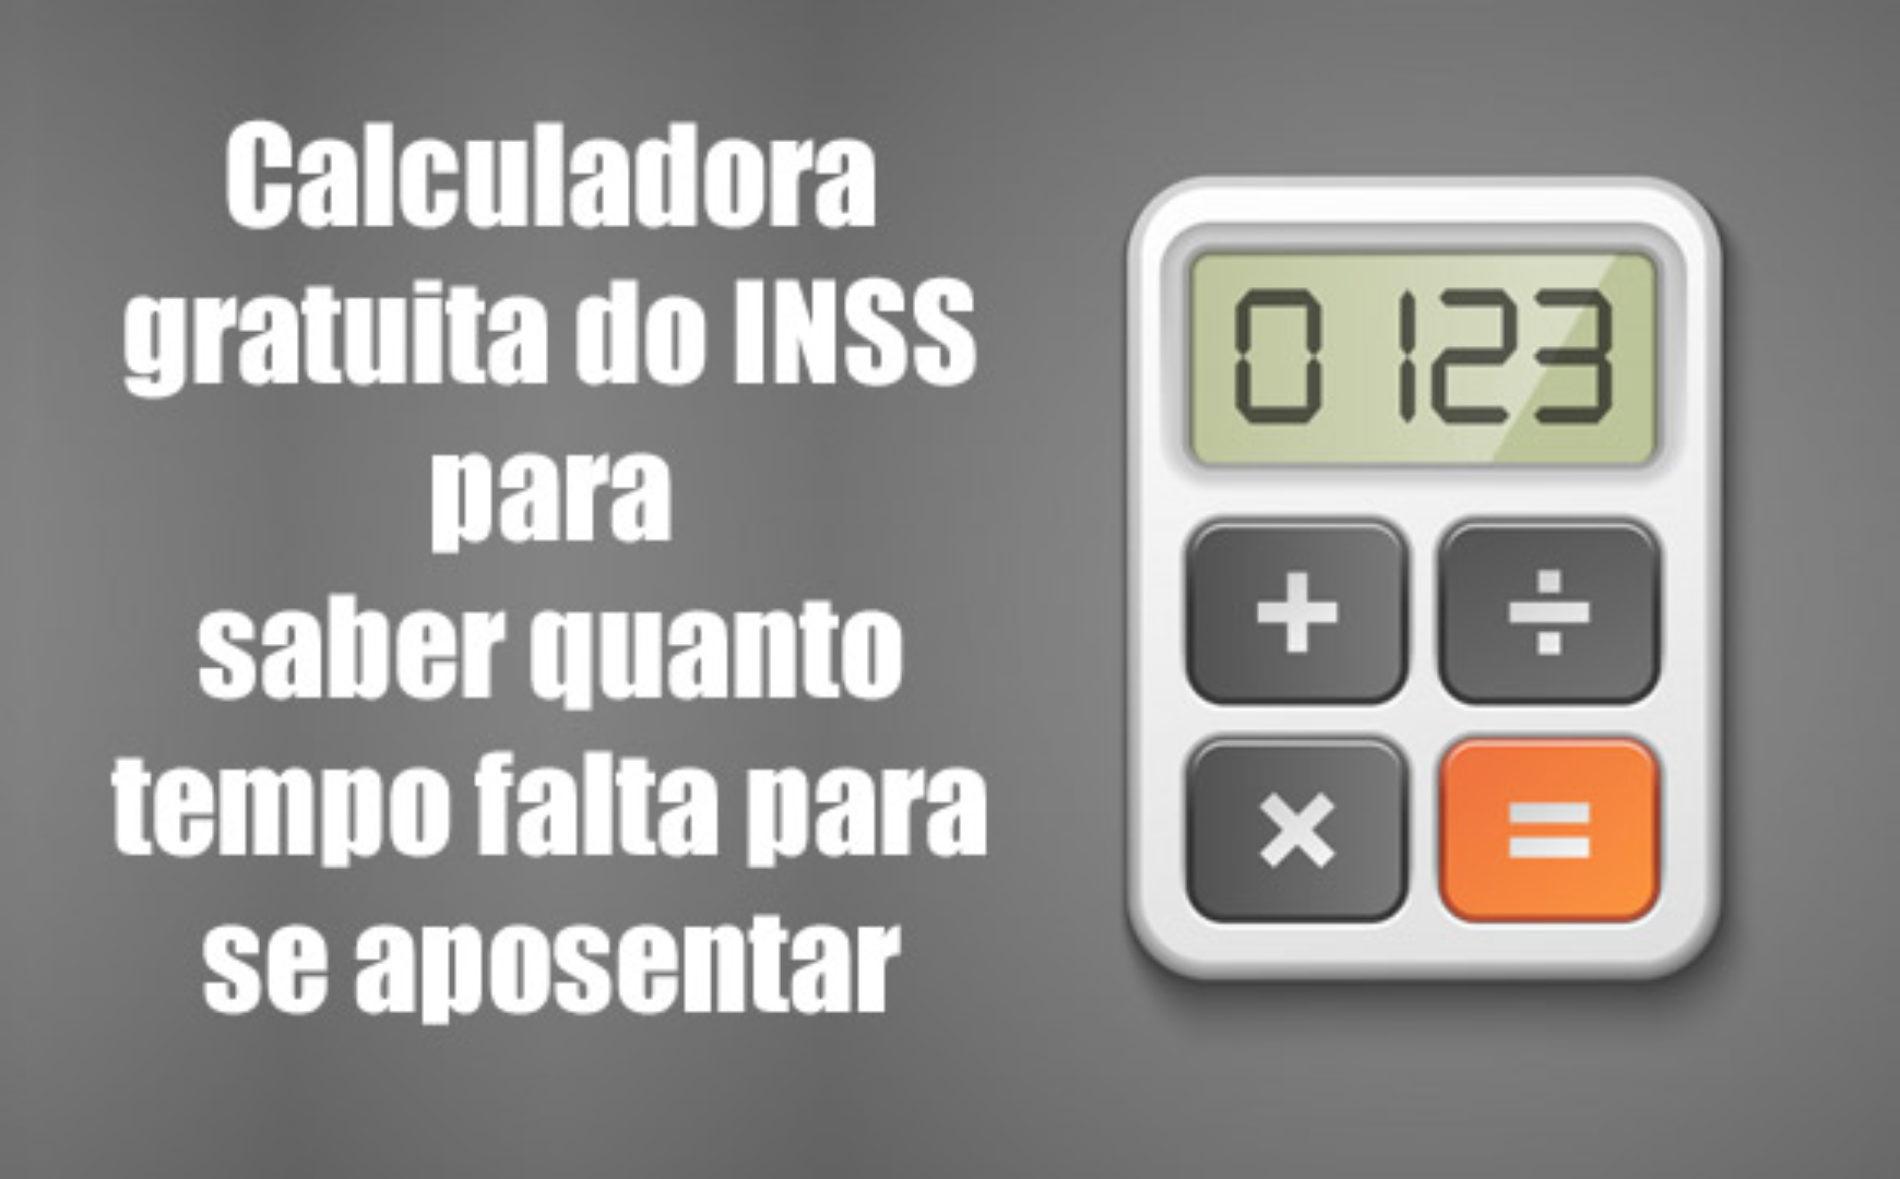 Calculadora online do INSS – Quanto tempo falta para aposentar?